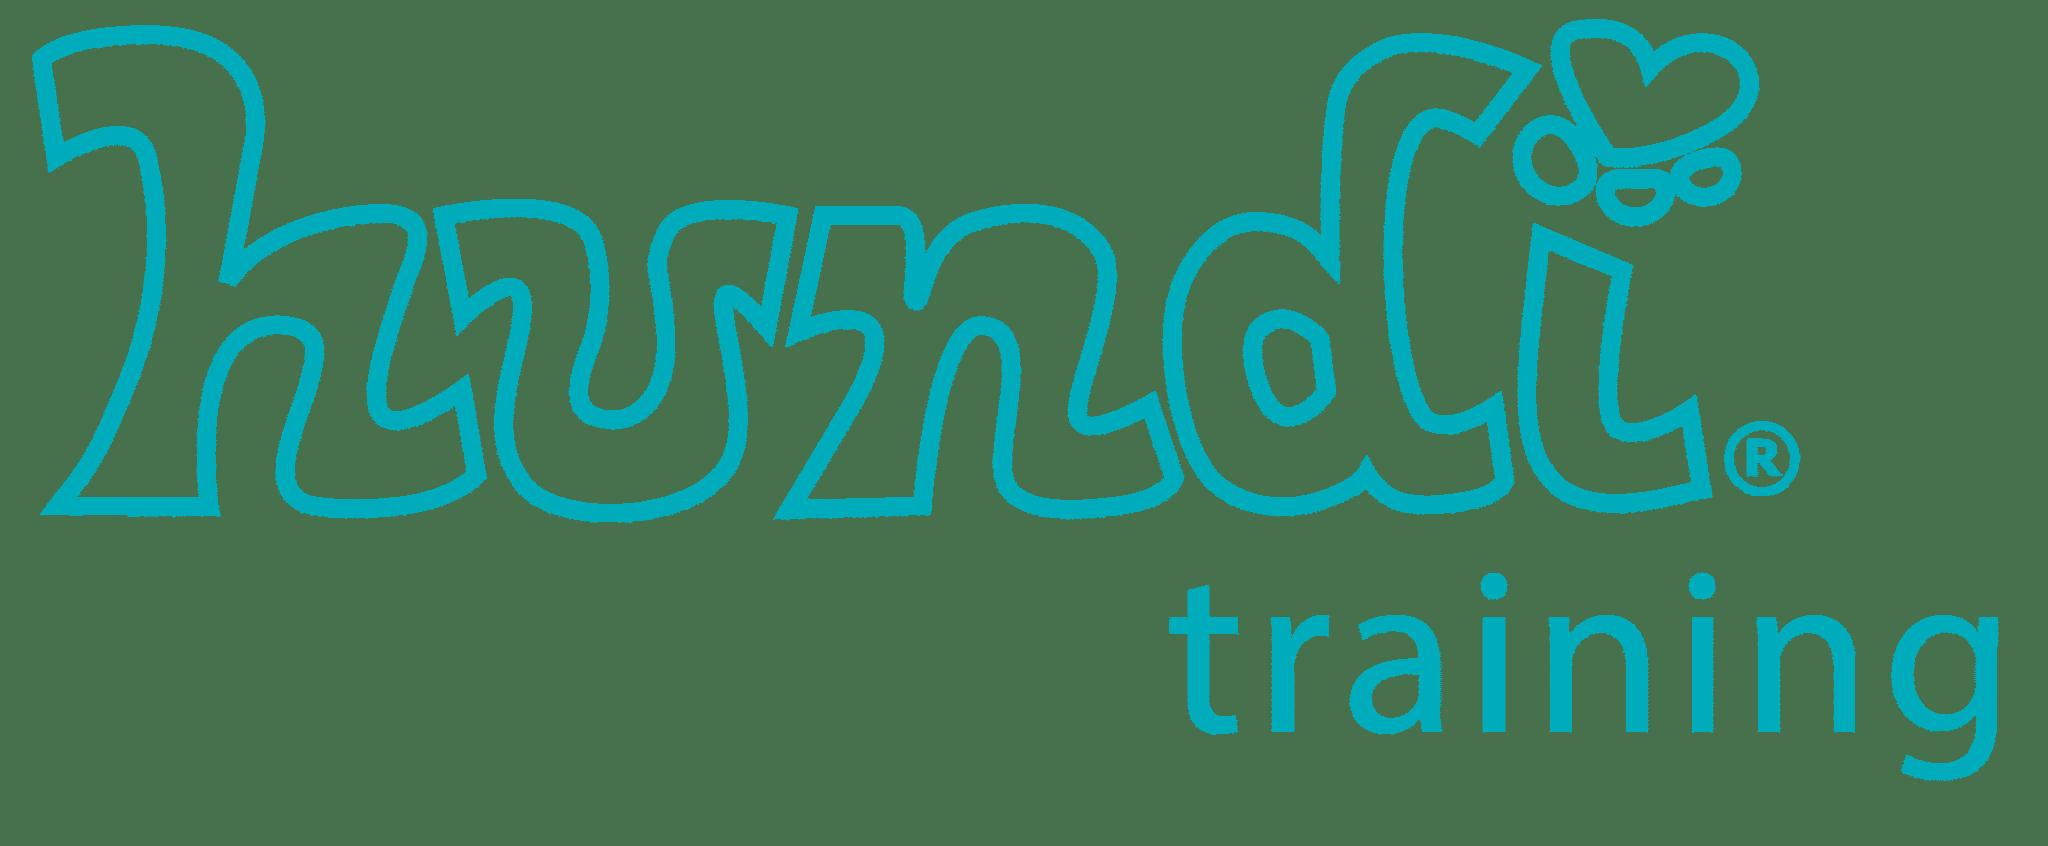 Hundeschule Hundi Training München Neuried